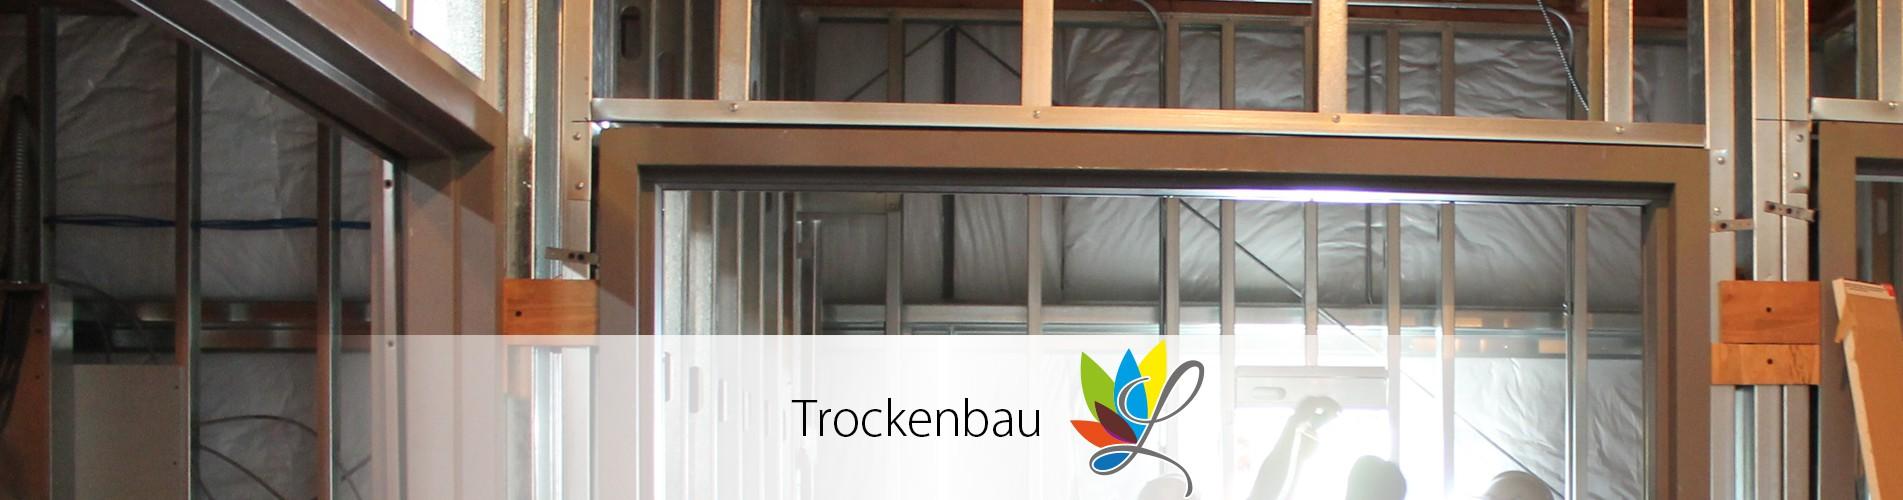 Trockenbau Eschweiler